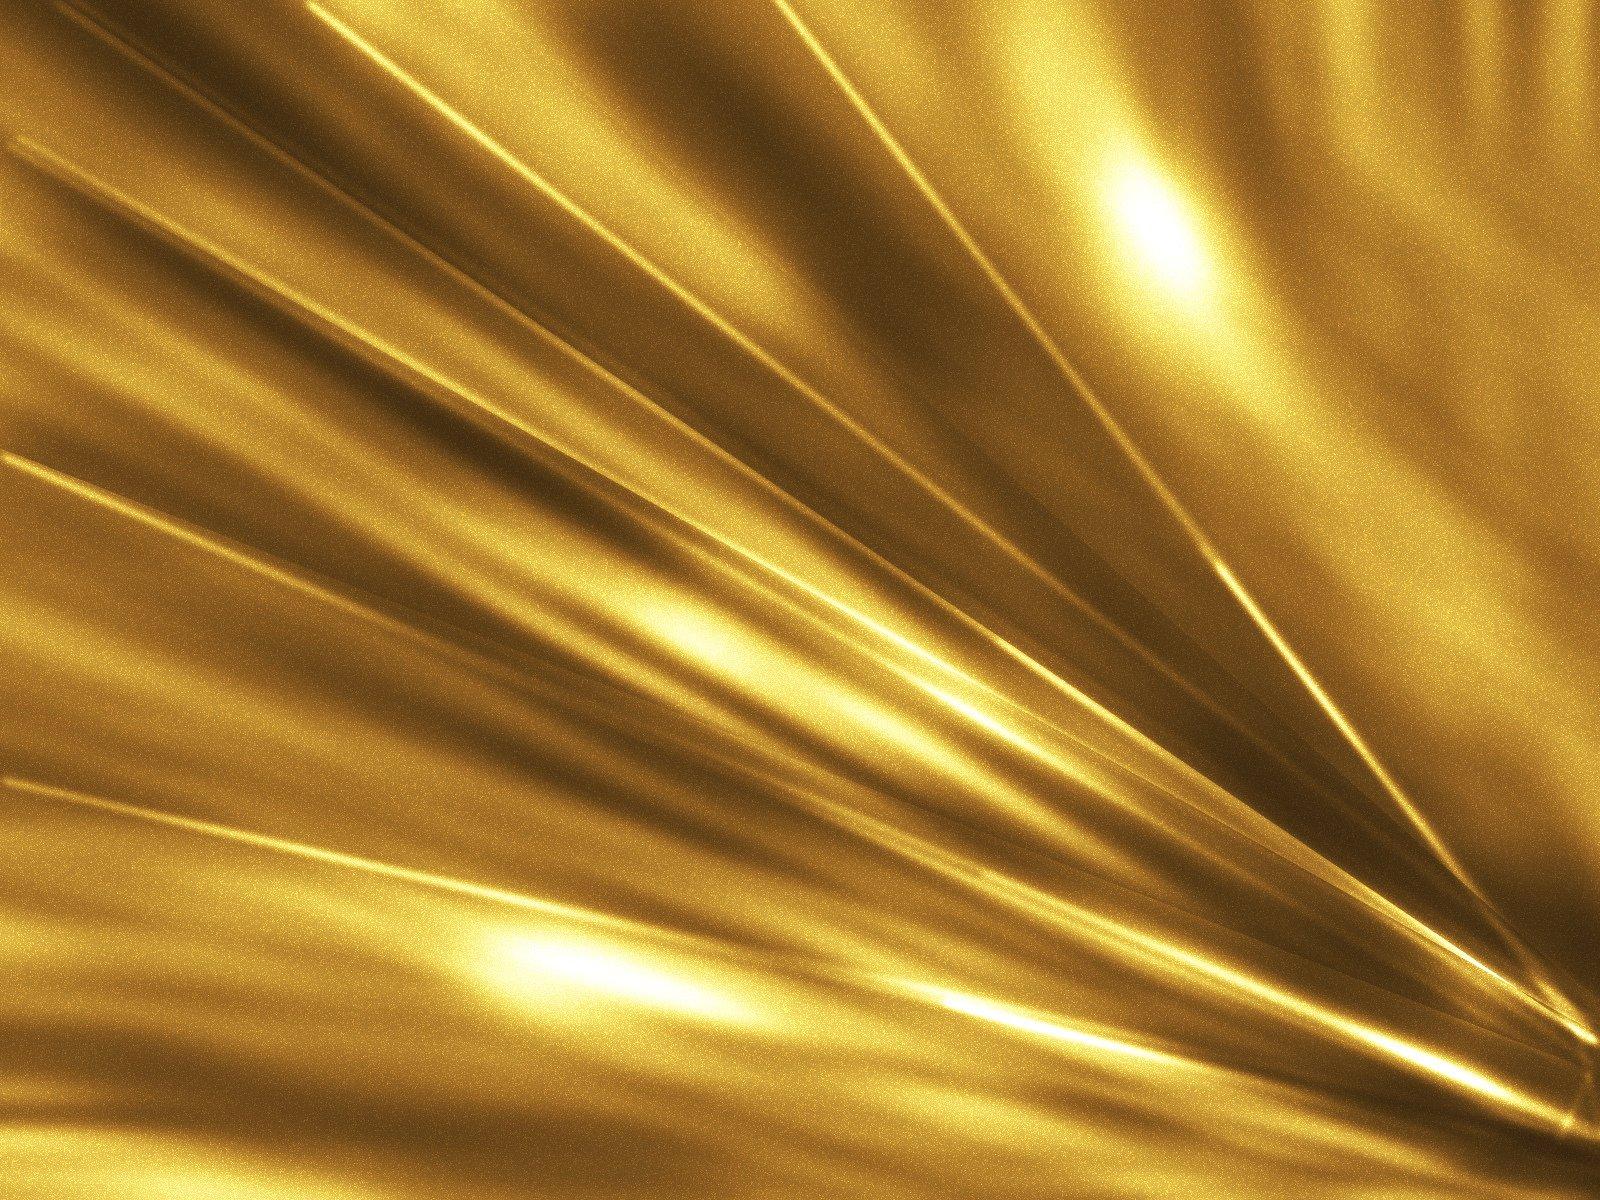 40 HD Gold Wallpaper Backgrounds For Desktop Download 1600x1200